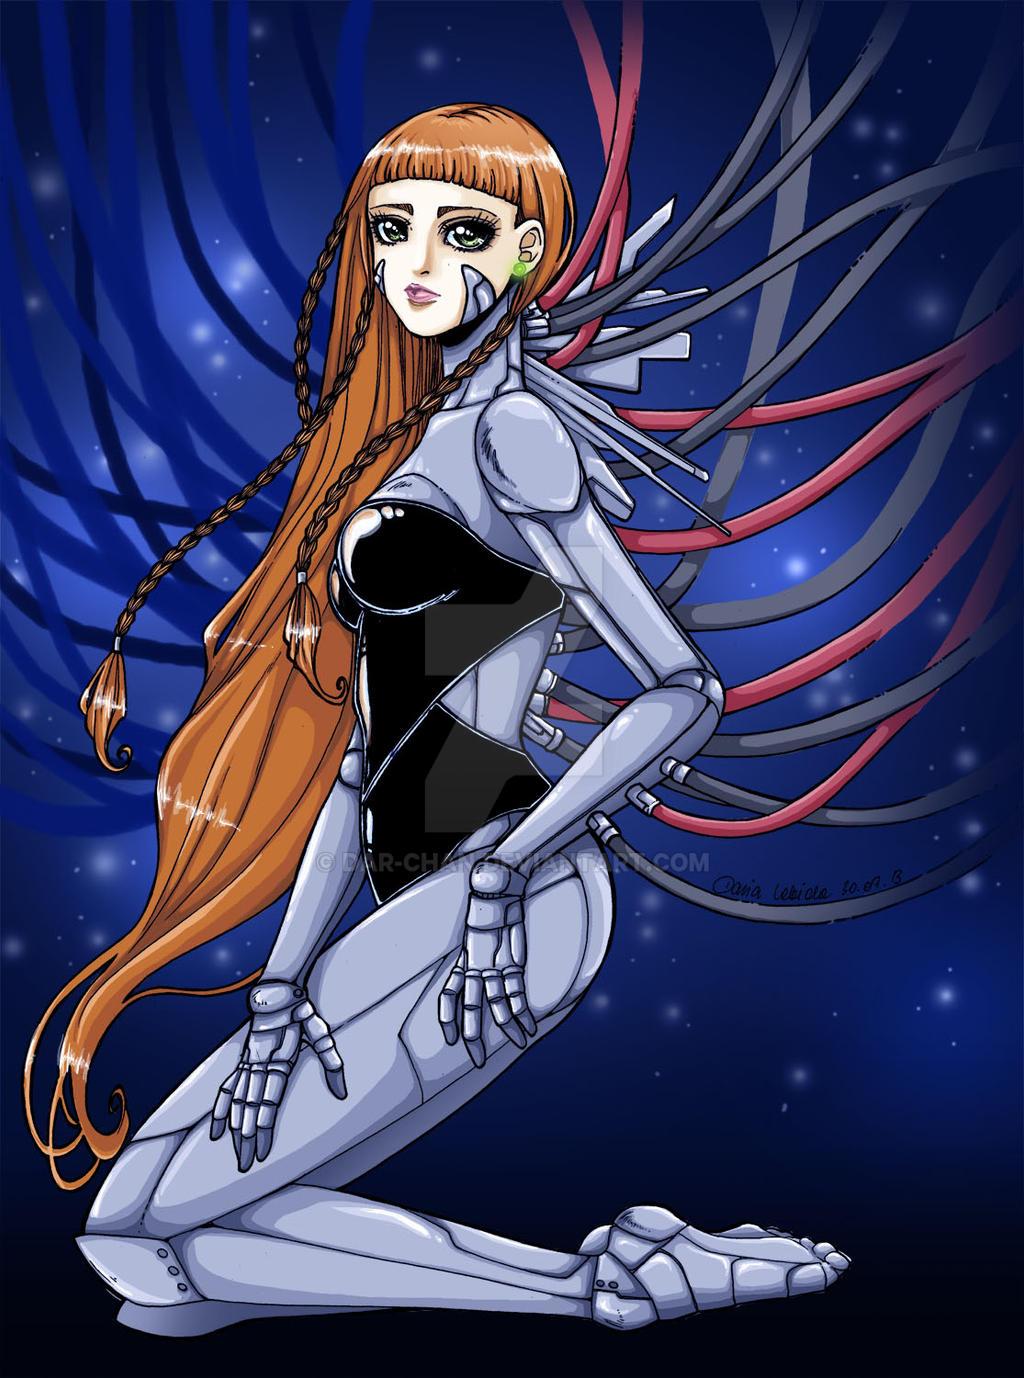 Cloe the cyborg girl by Dar-chan on DeviantArt